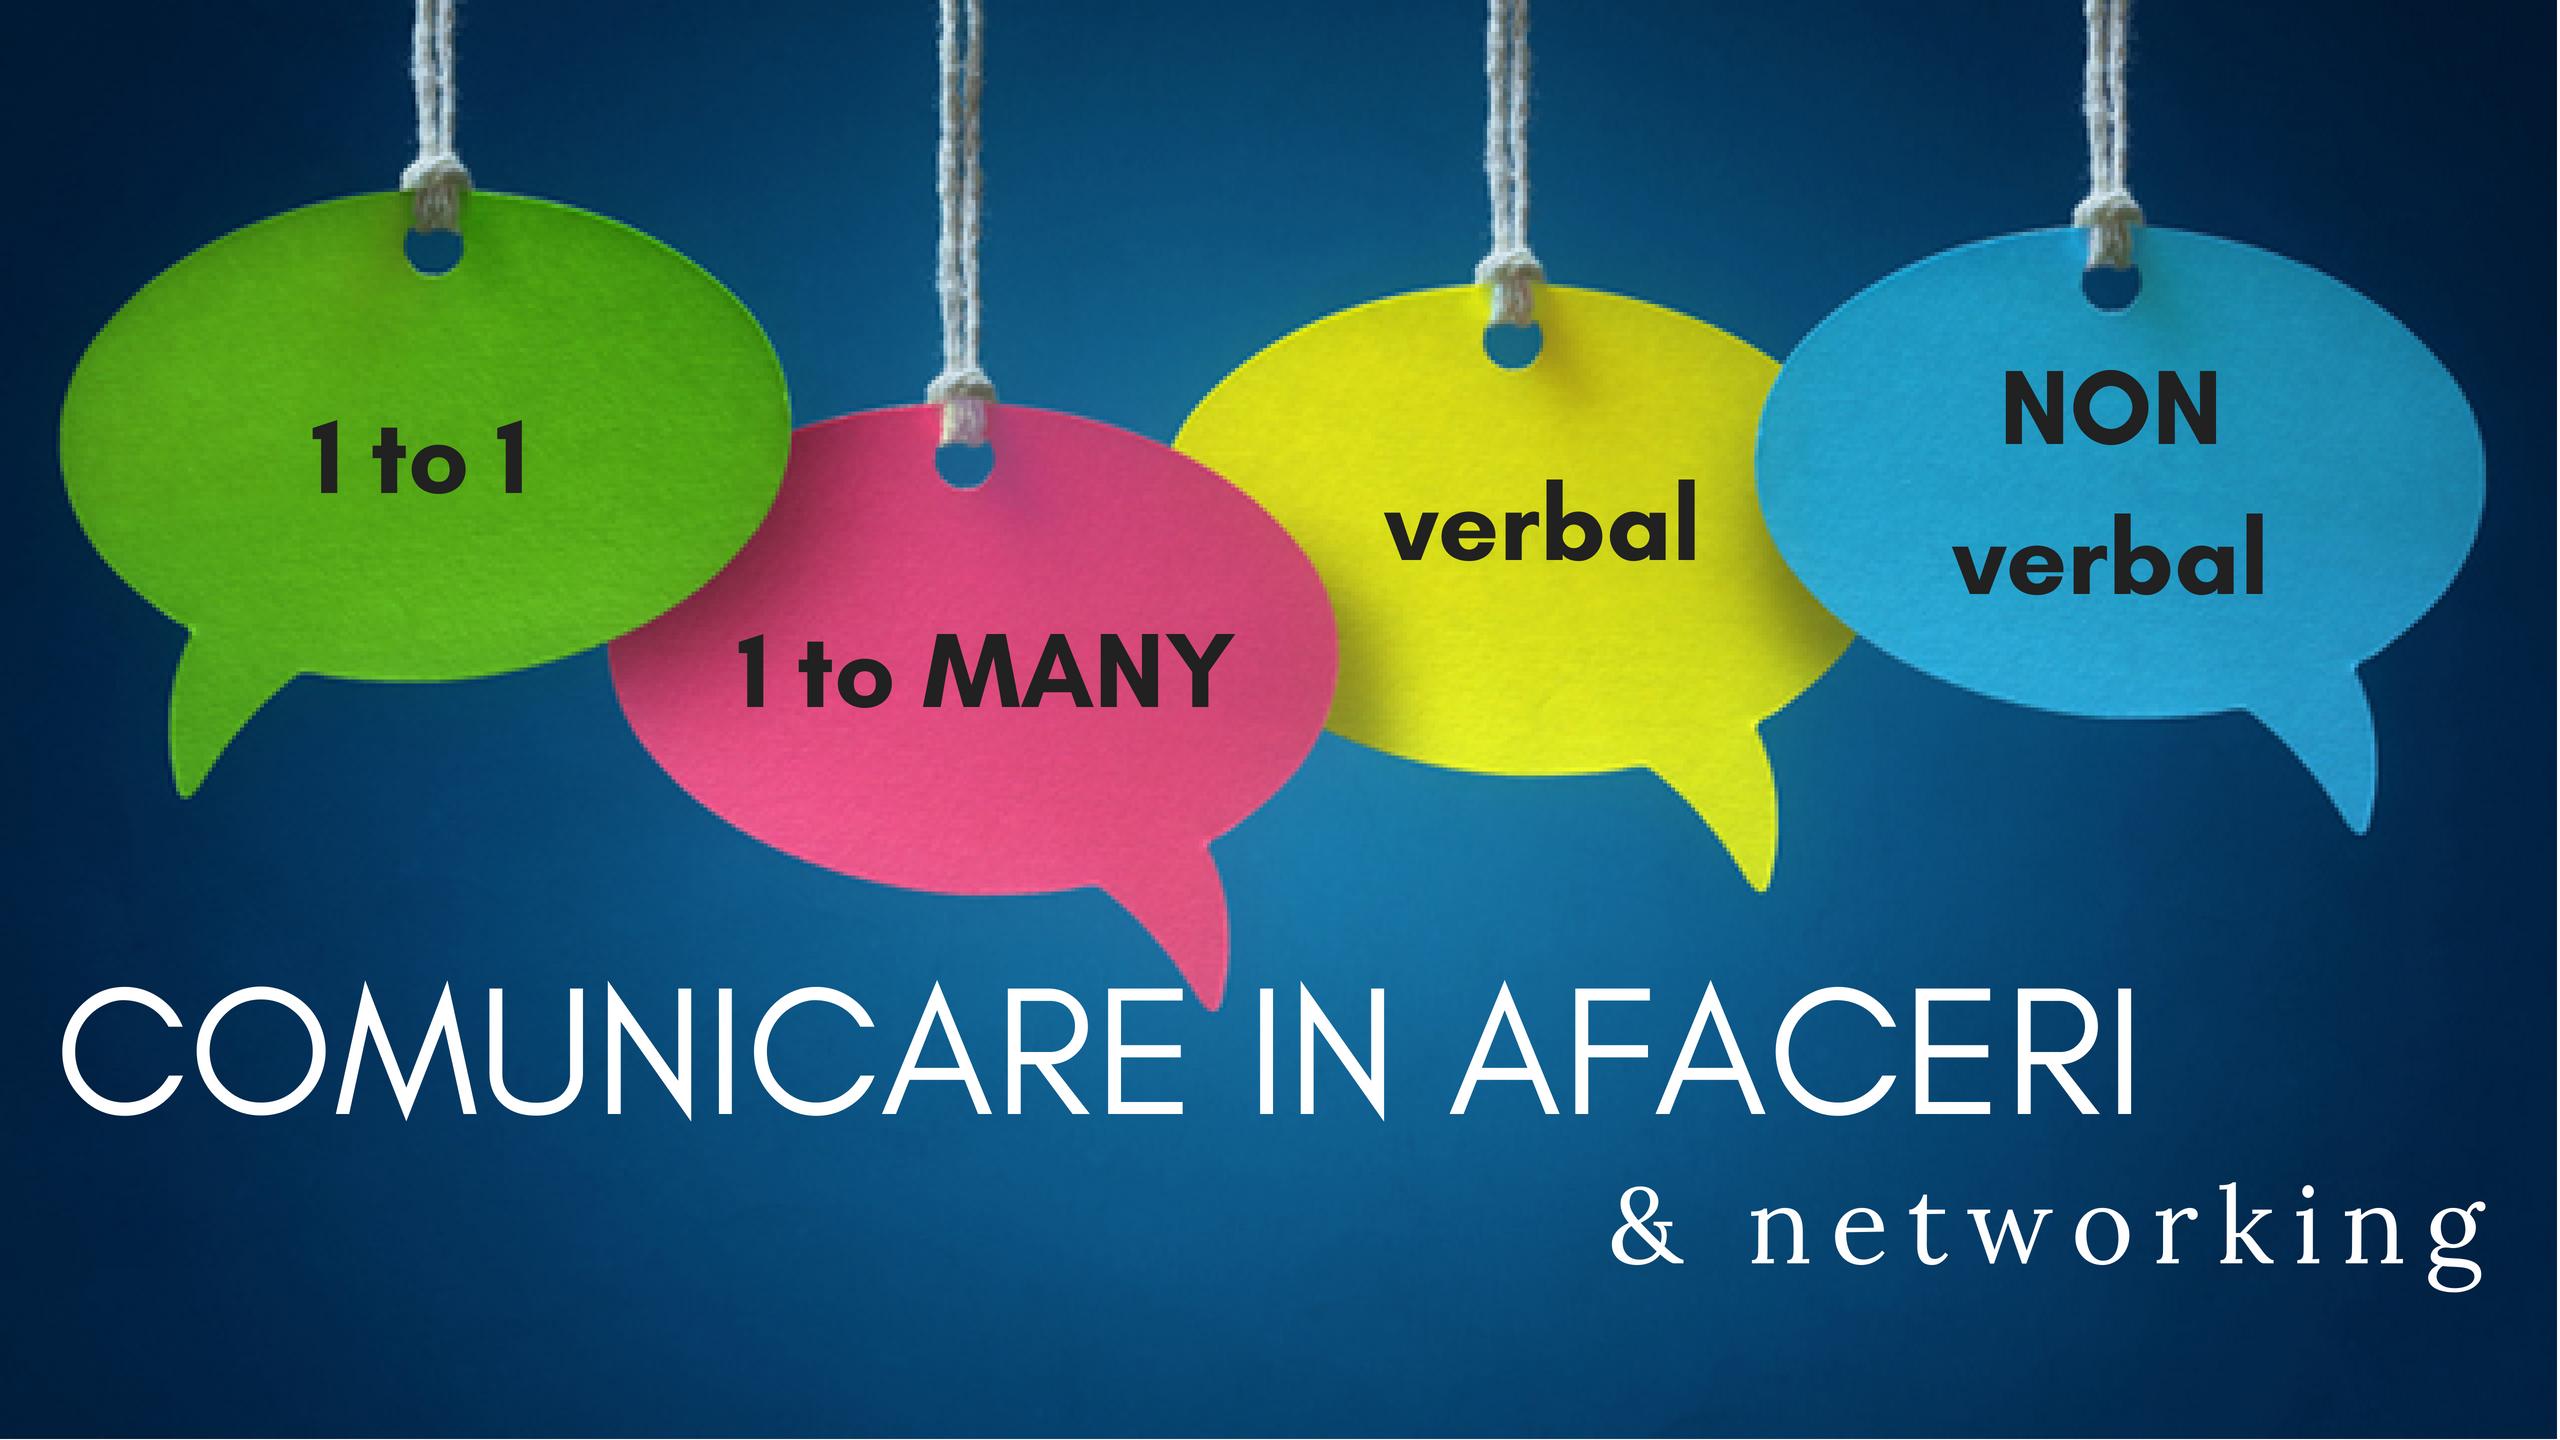 SEMINAR COMUNICARE IN AFACERI & NETWORKING